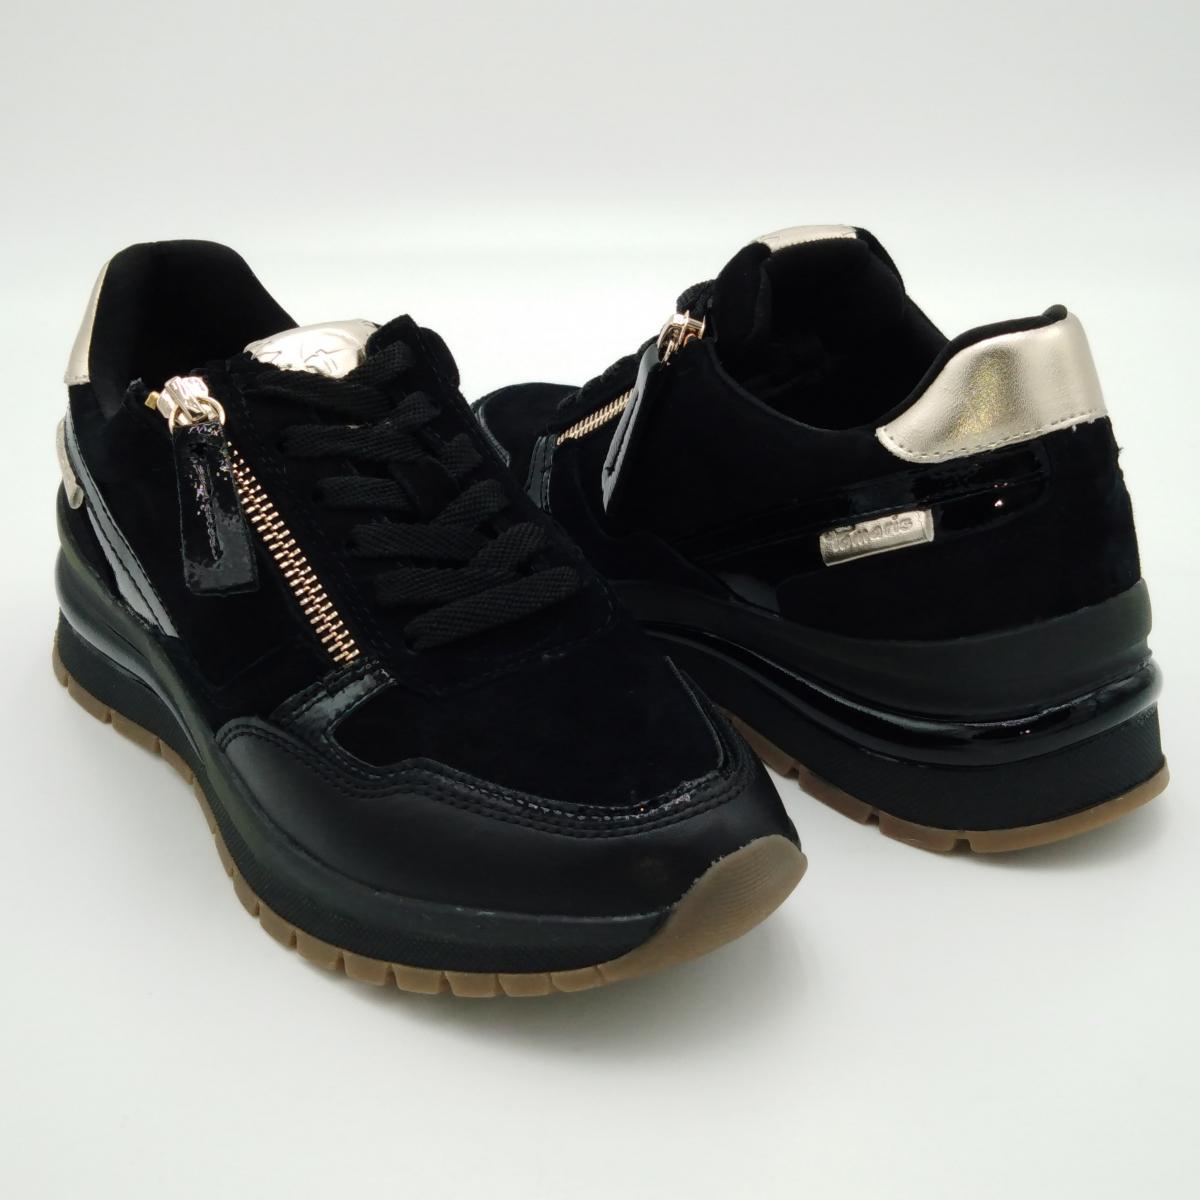 Tamaris -Sneaker lacci nero...